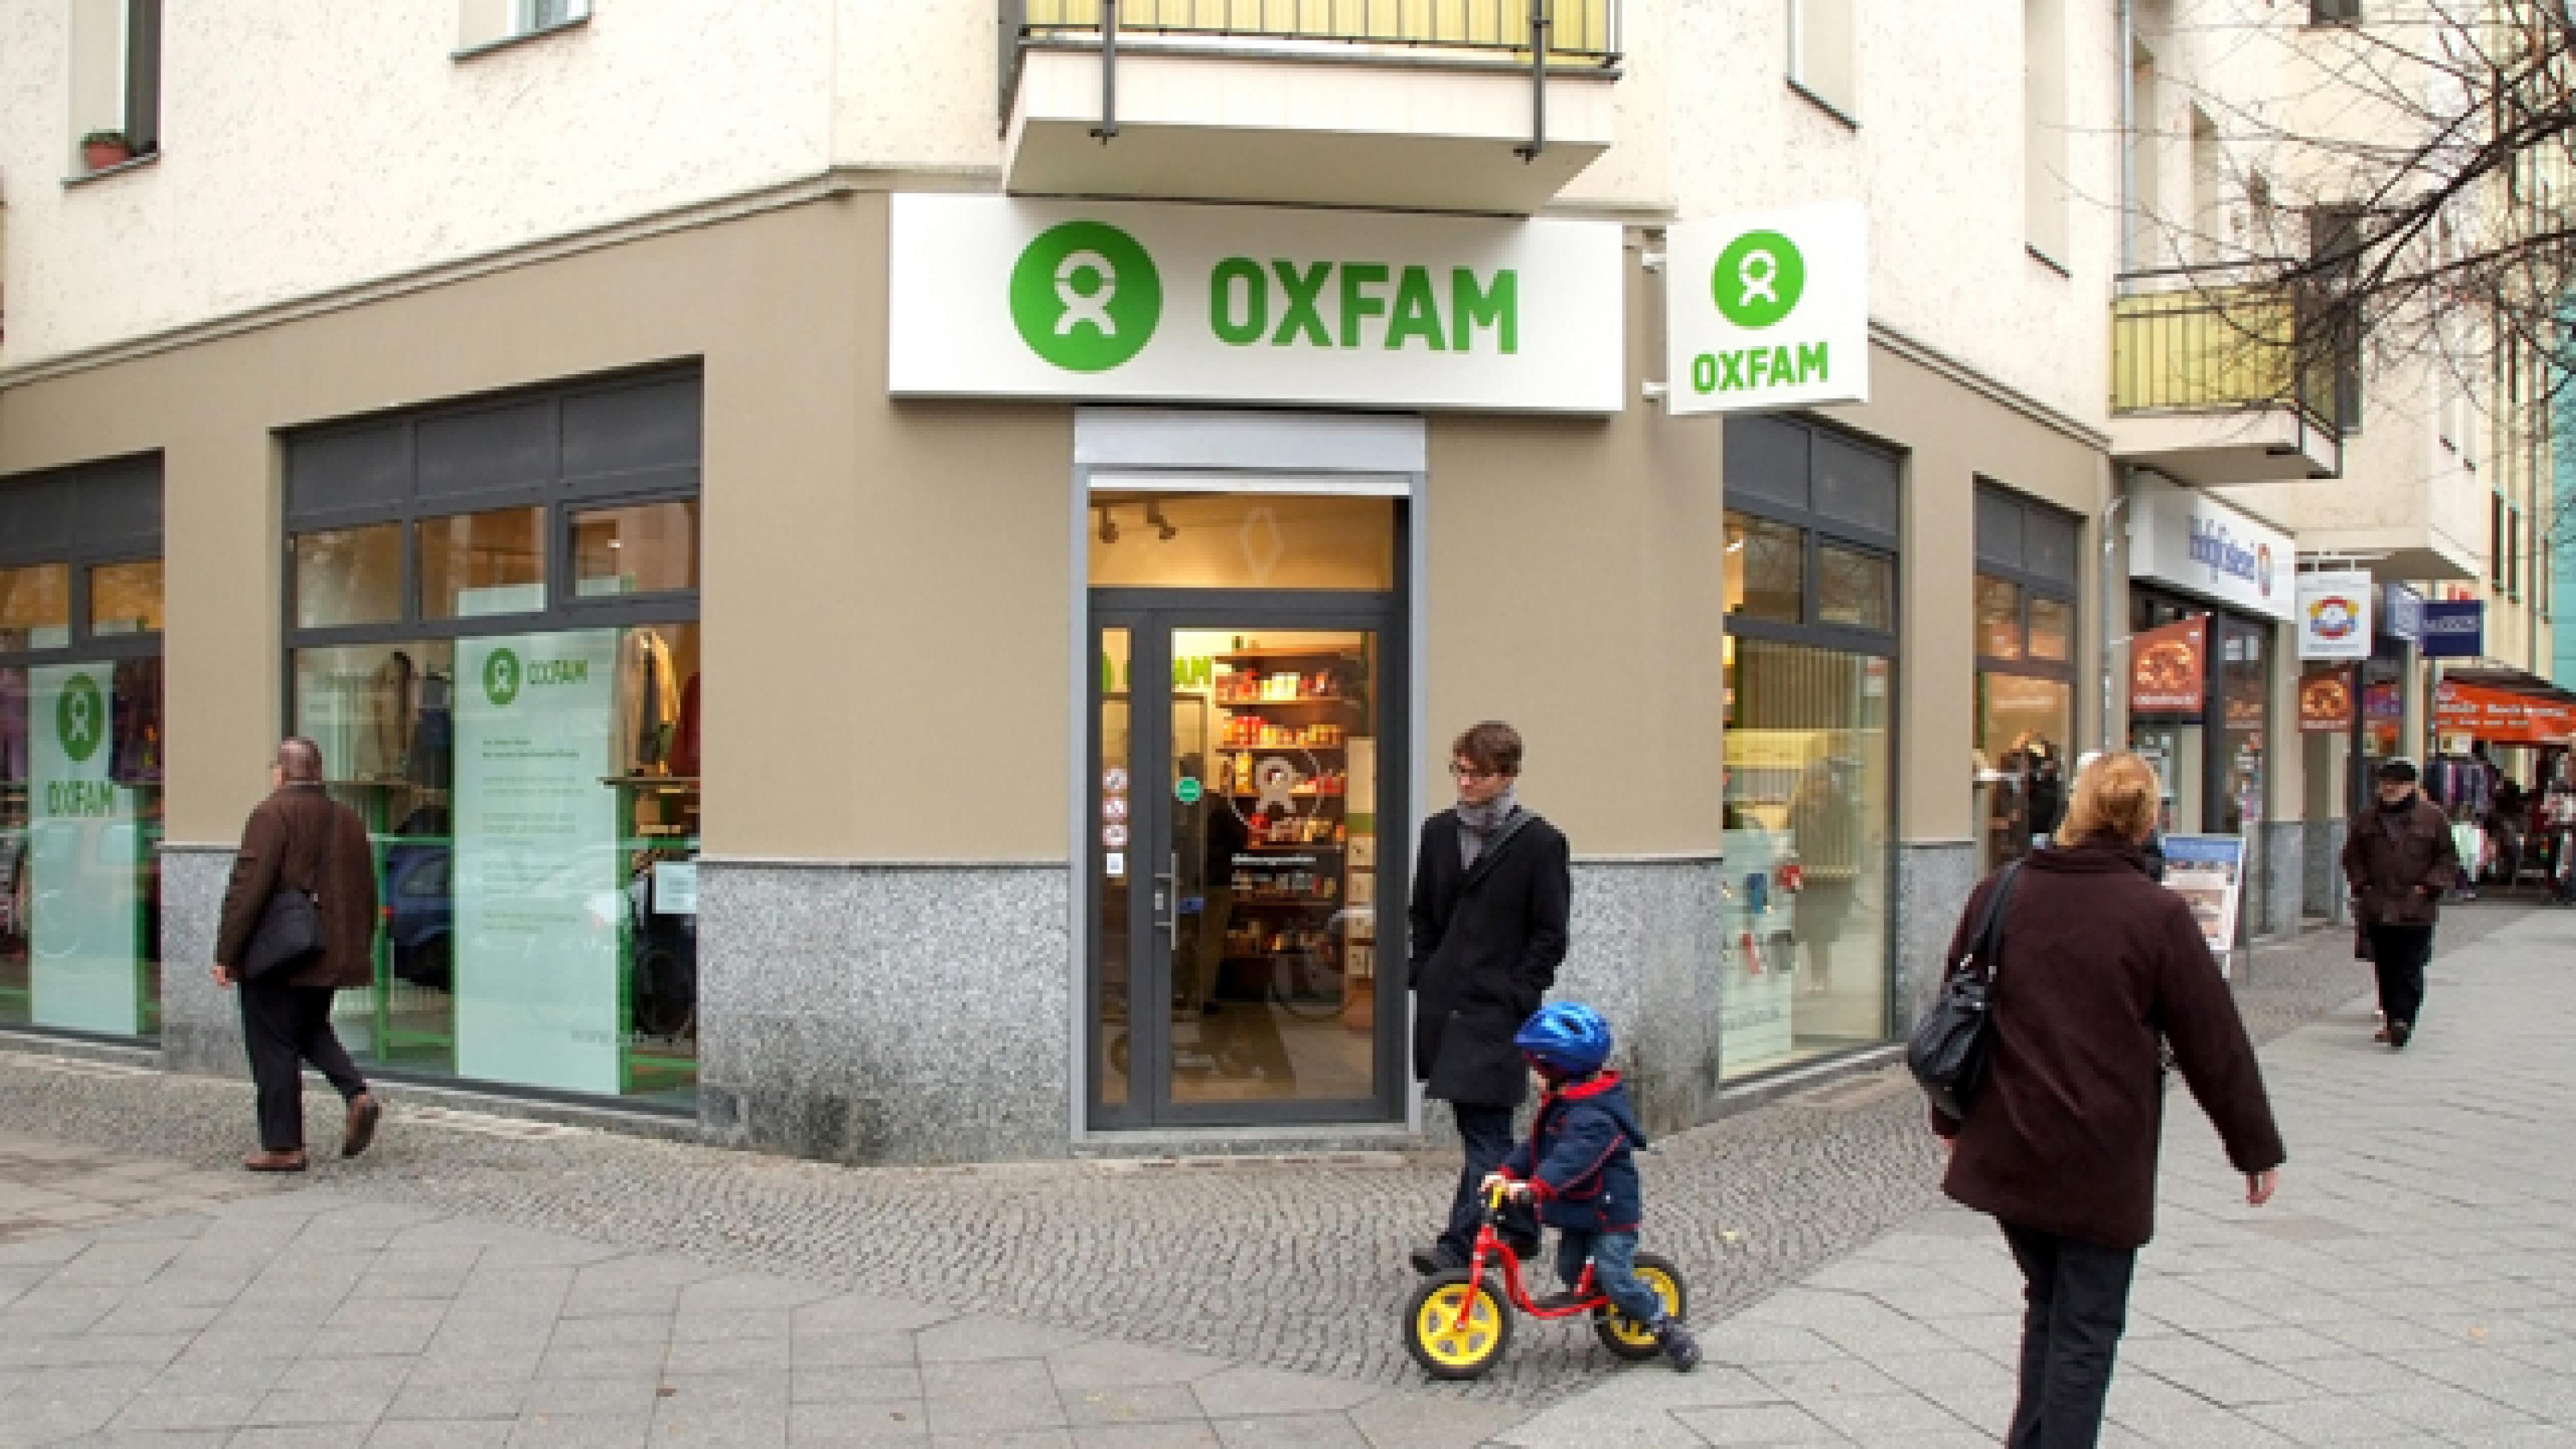 secondhand kaufen spenden in berlin prenzlauer berg oxfam shop. Black Bedroom Furniture Sets. Home Design Ideas